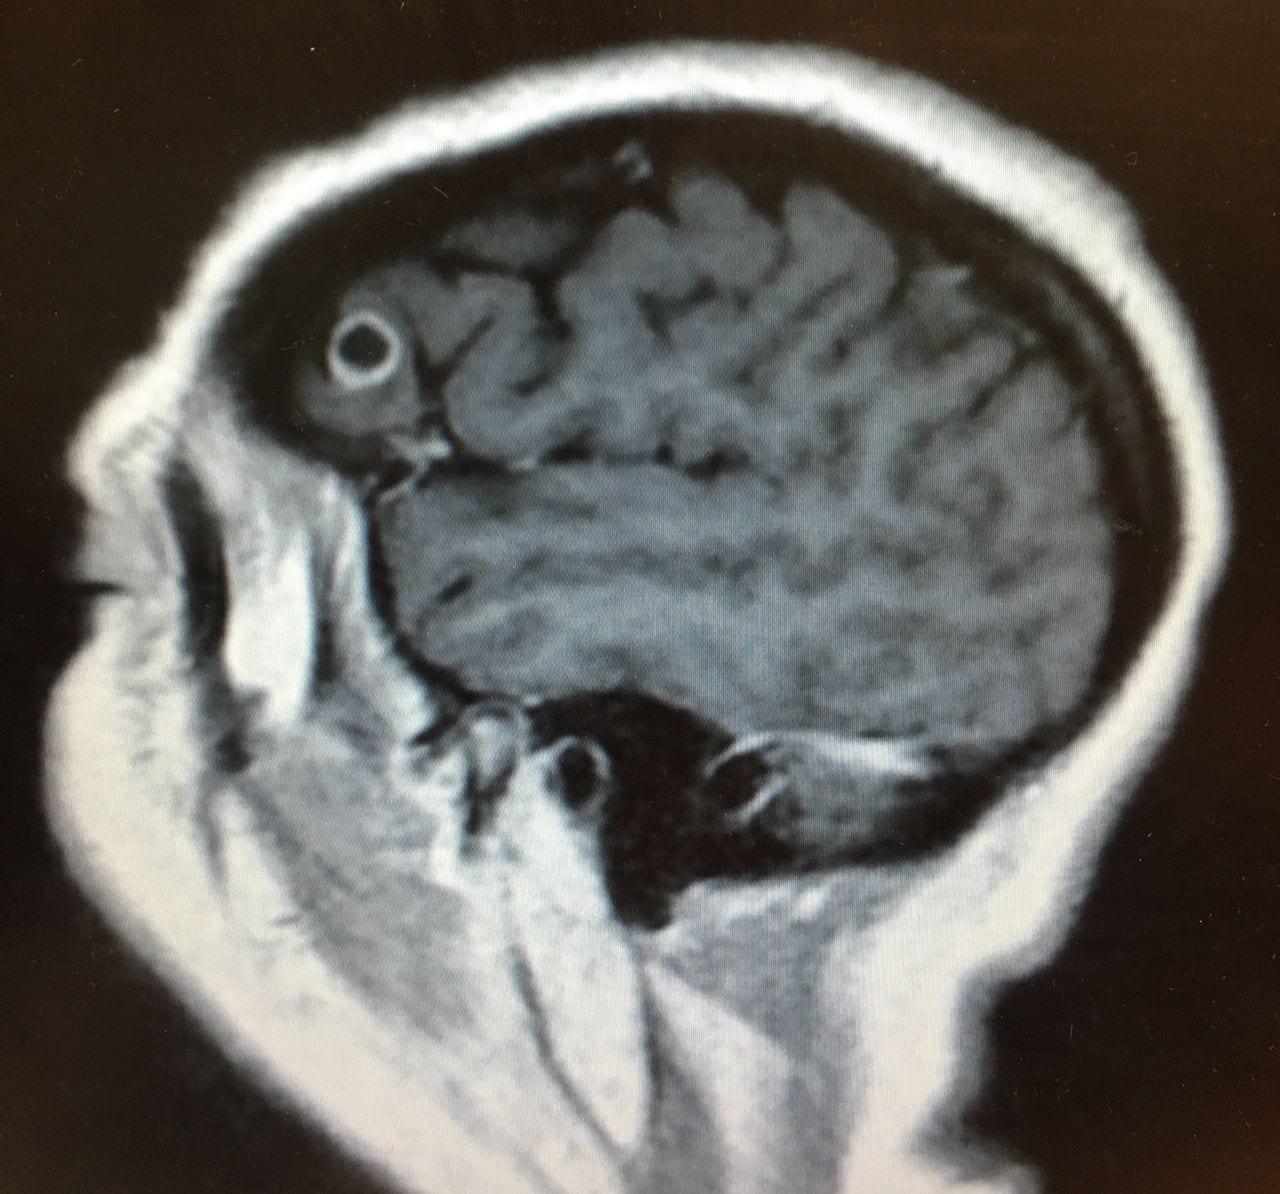 parazita az agyban